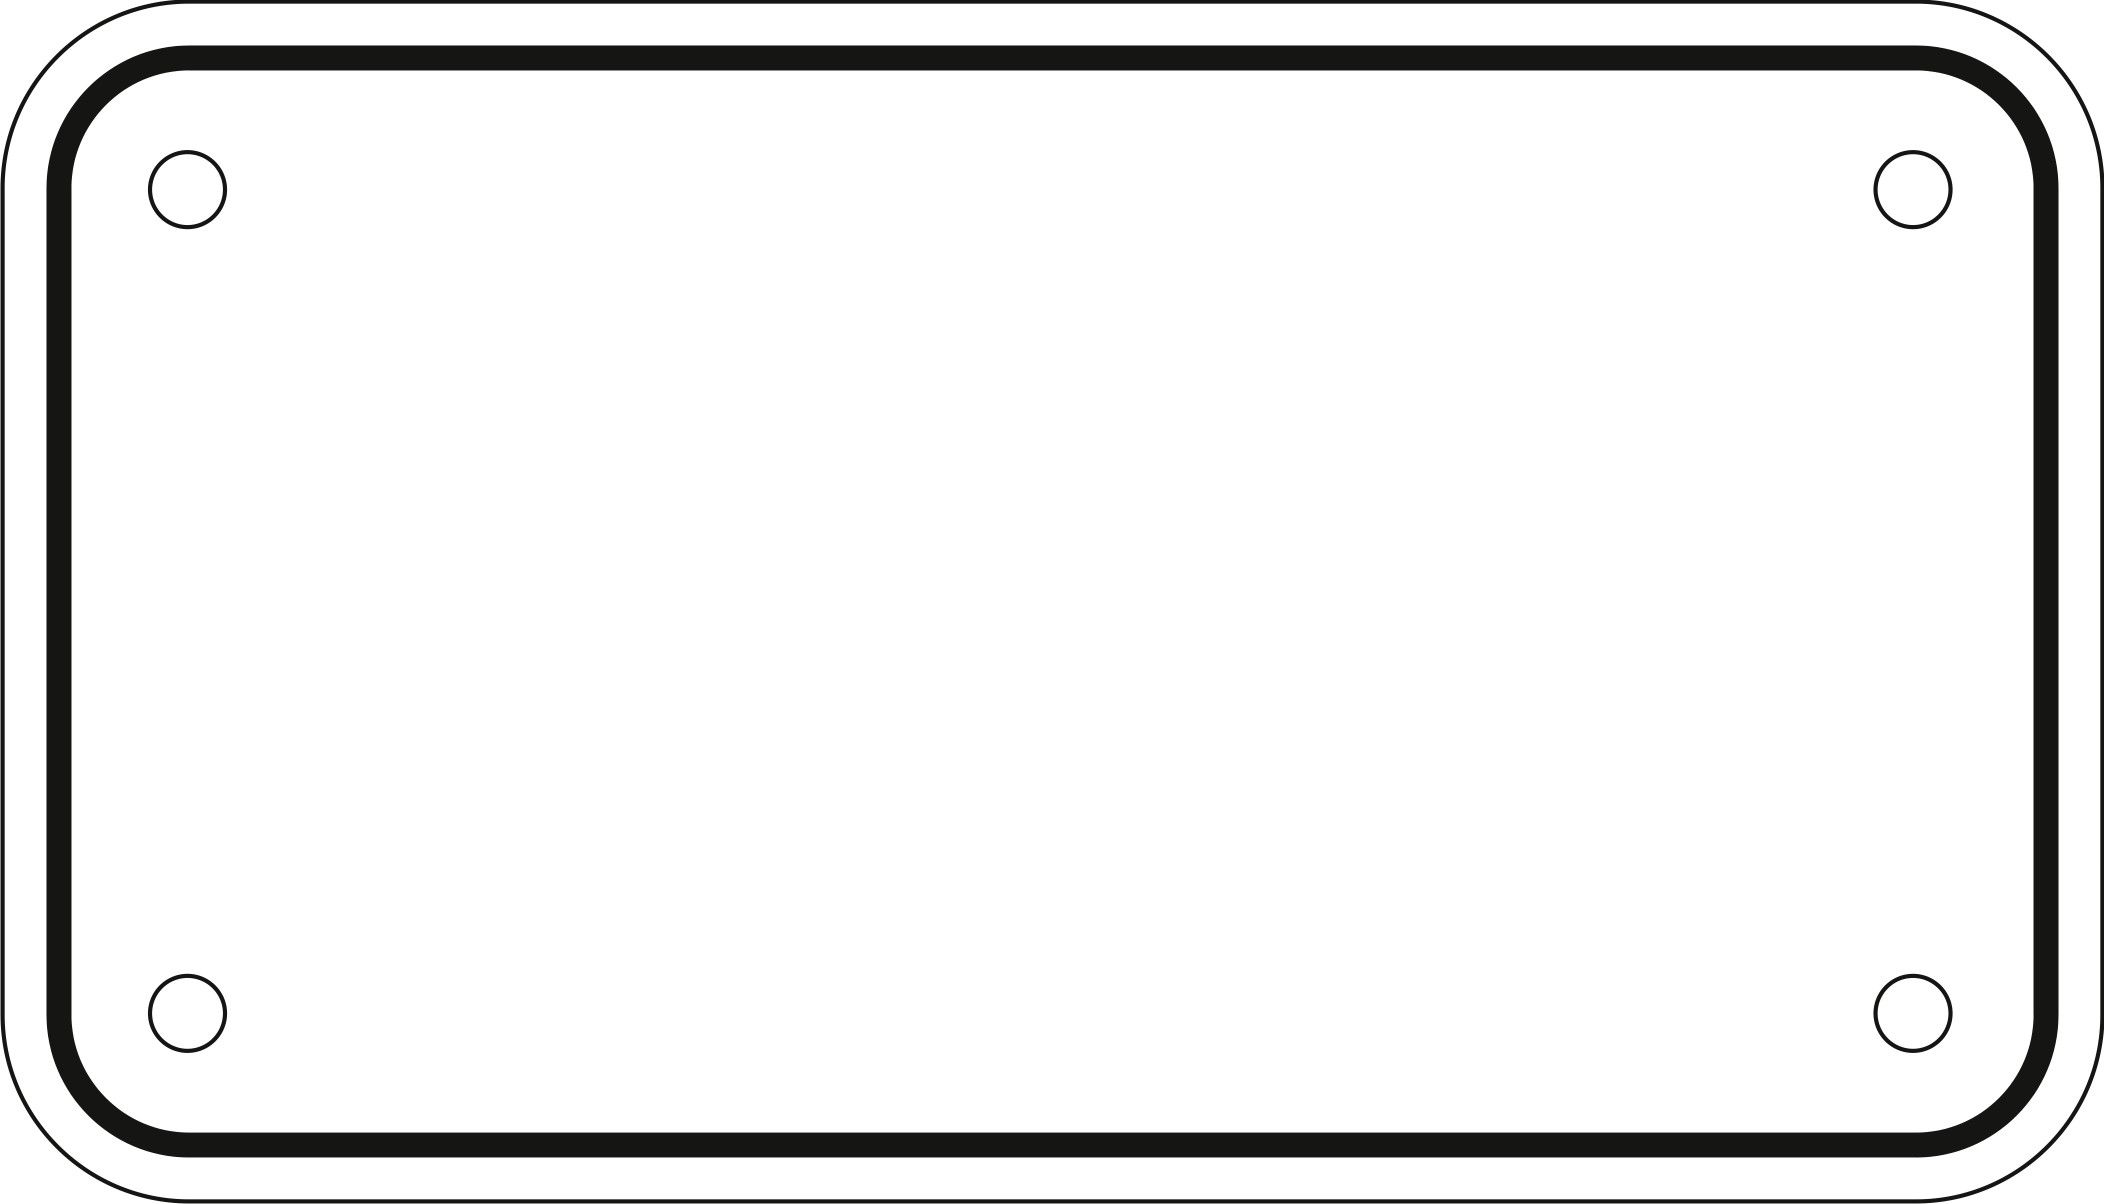 Louisiana License Plate Template Google Search Template Printable Templates Letter Templates